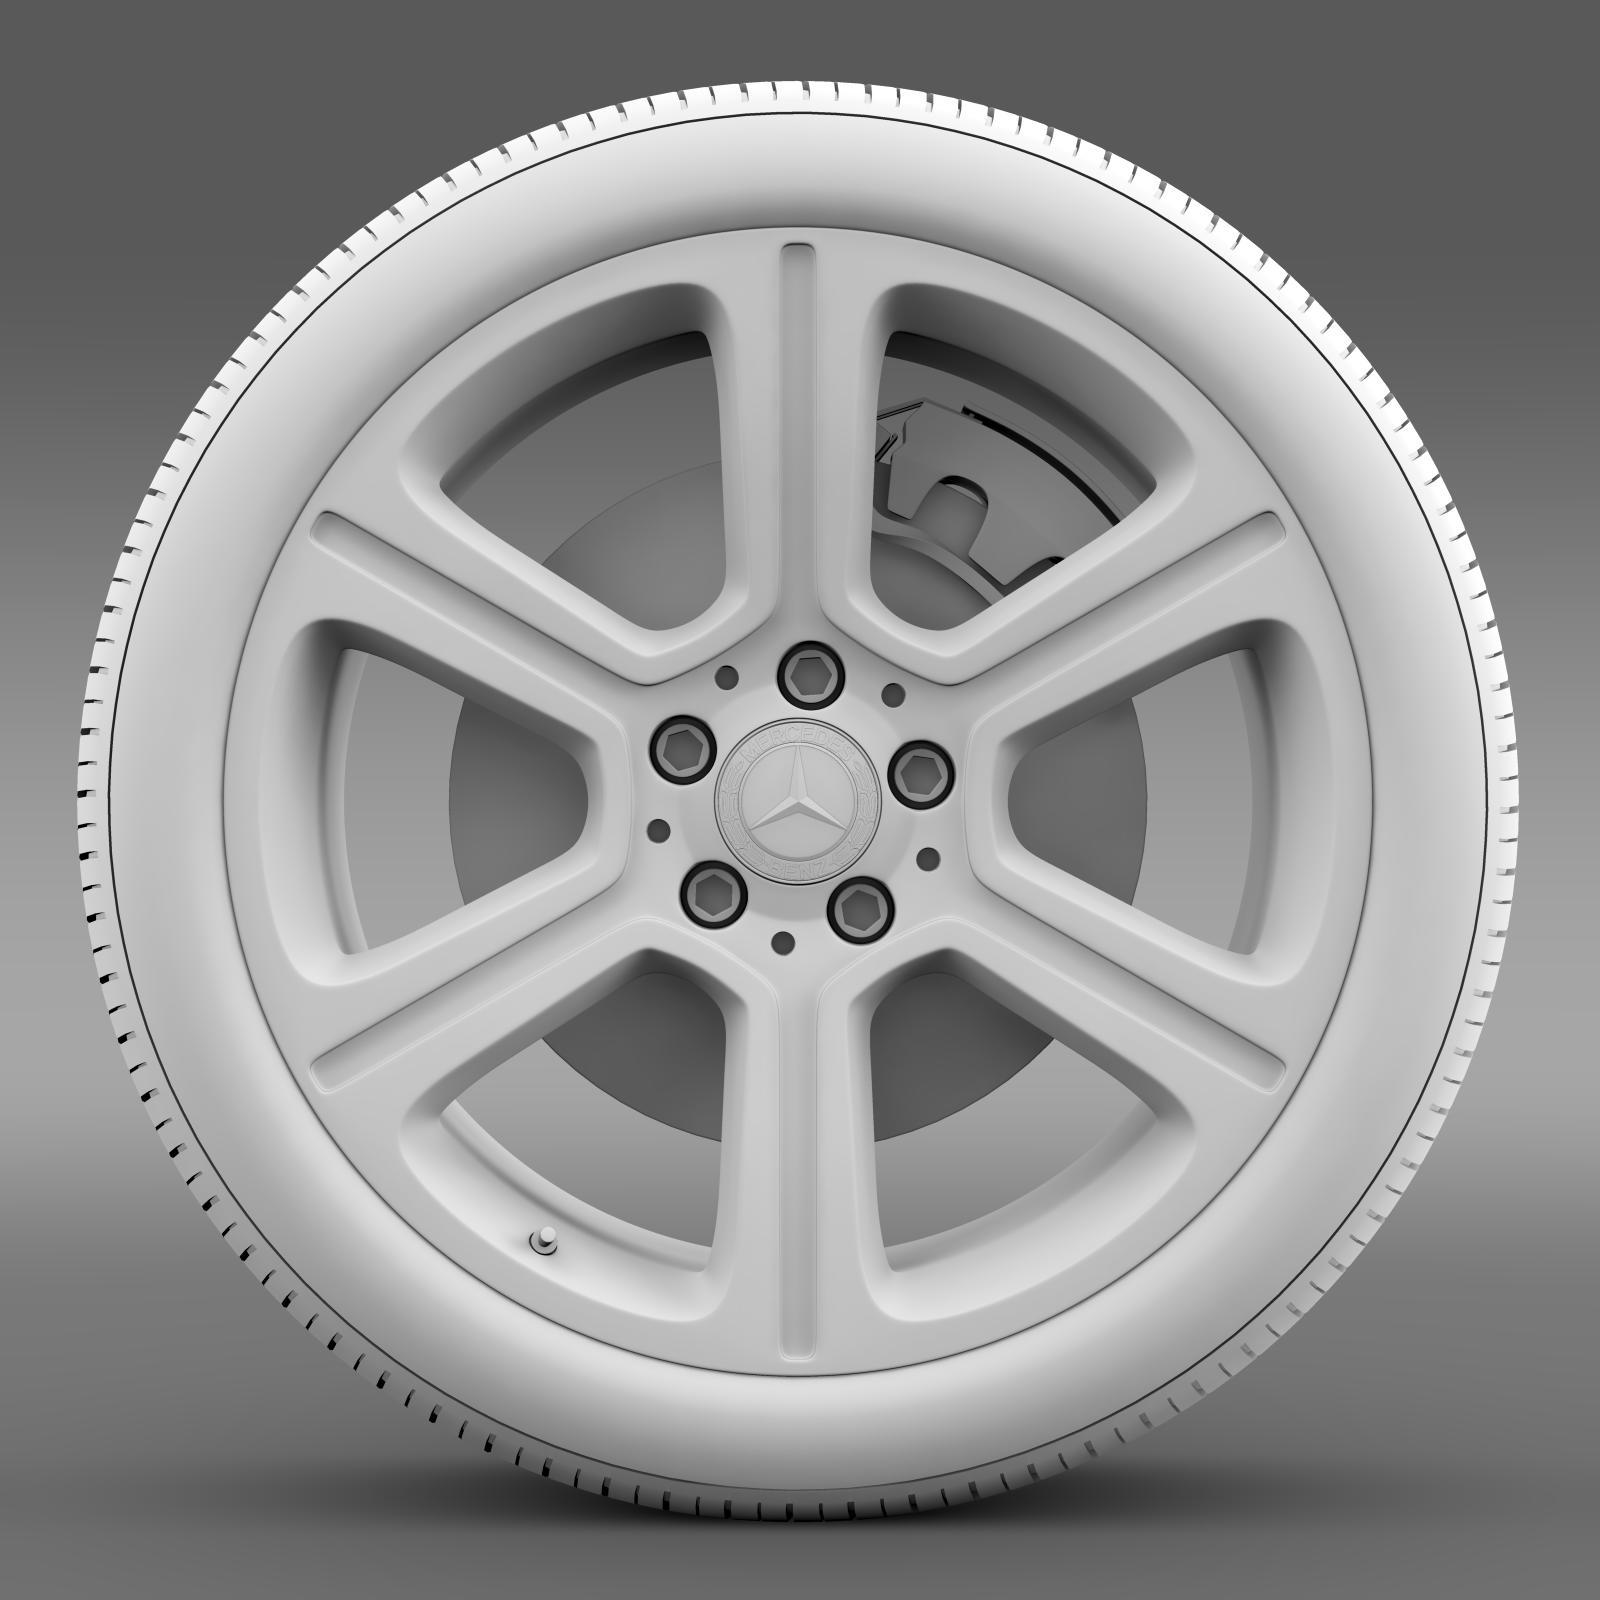 mercedes benz c 300 exclusive line wheel 3d model 3ds max fbx c4d lwo ma mb hrc xsi obj 210777